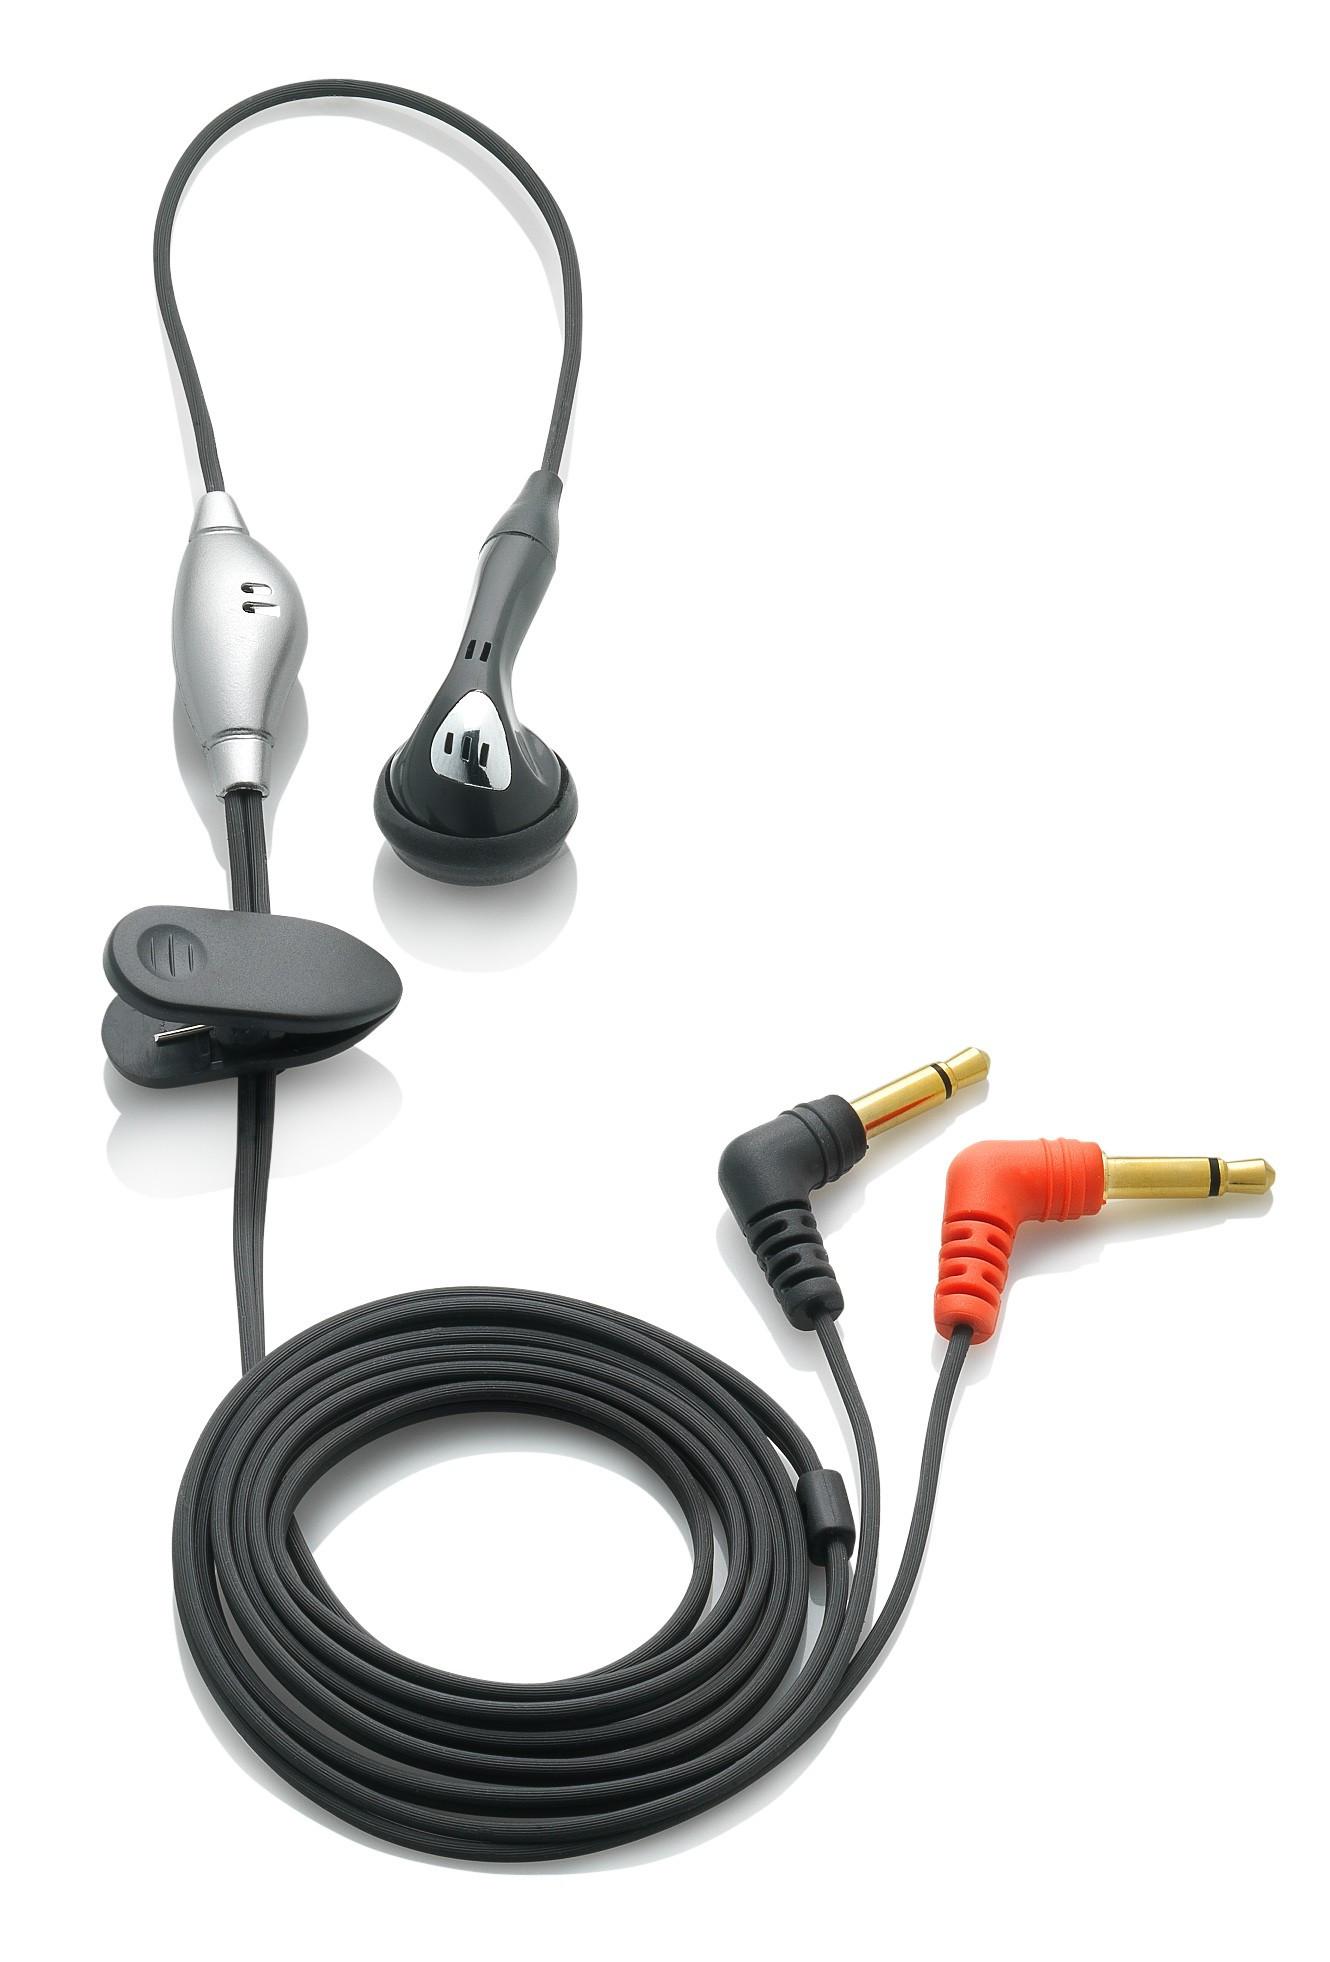 Philips LFH0331 headset